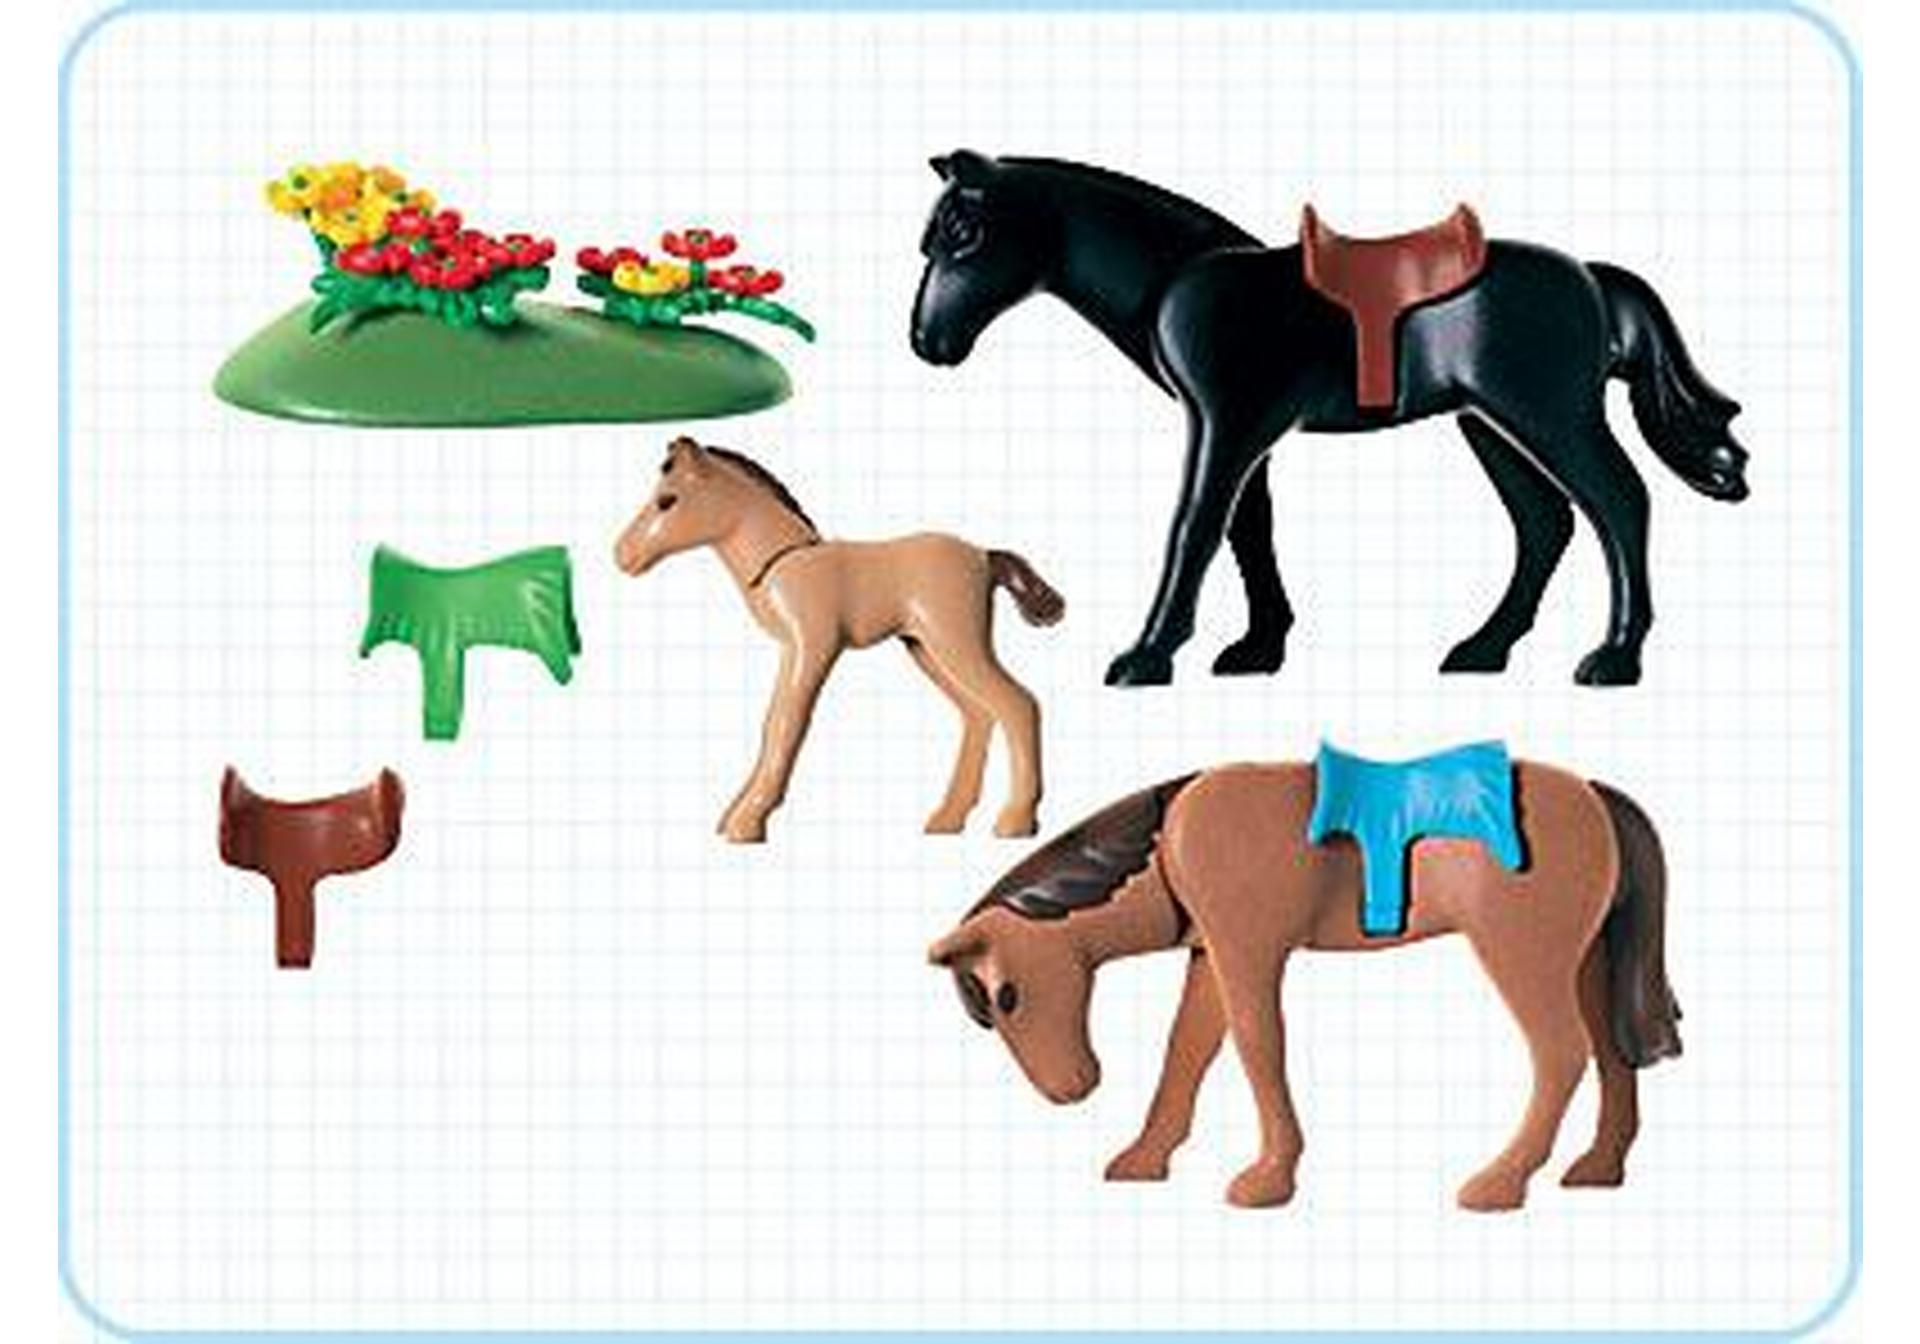 2 pferde mit fohlen 3114 b playmobil - Pferde playmobil ...